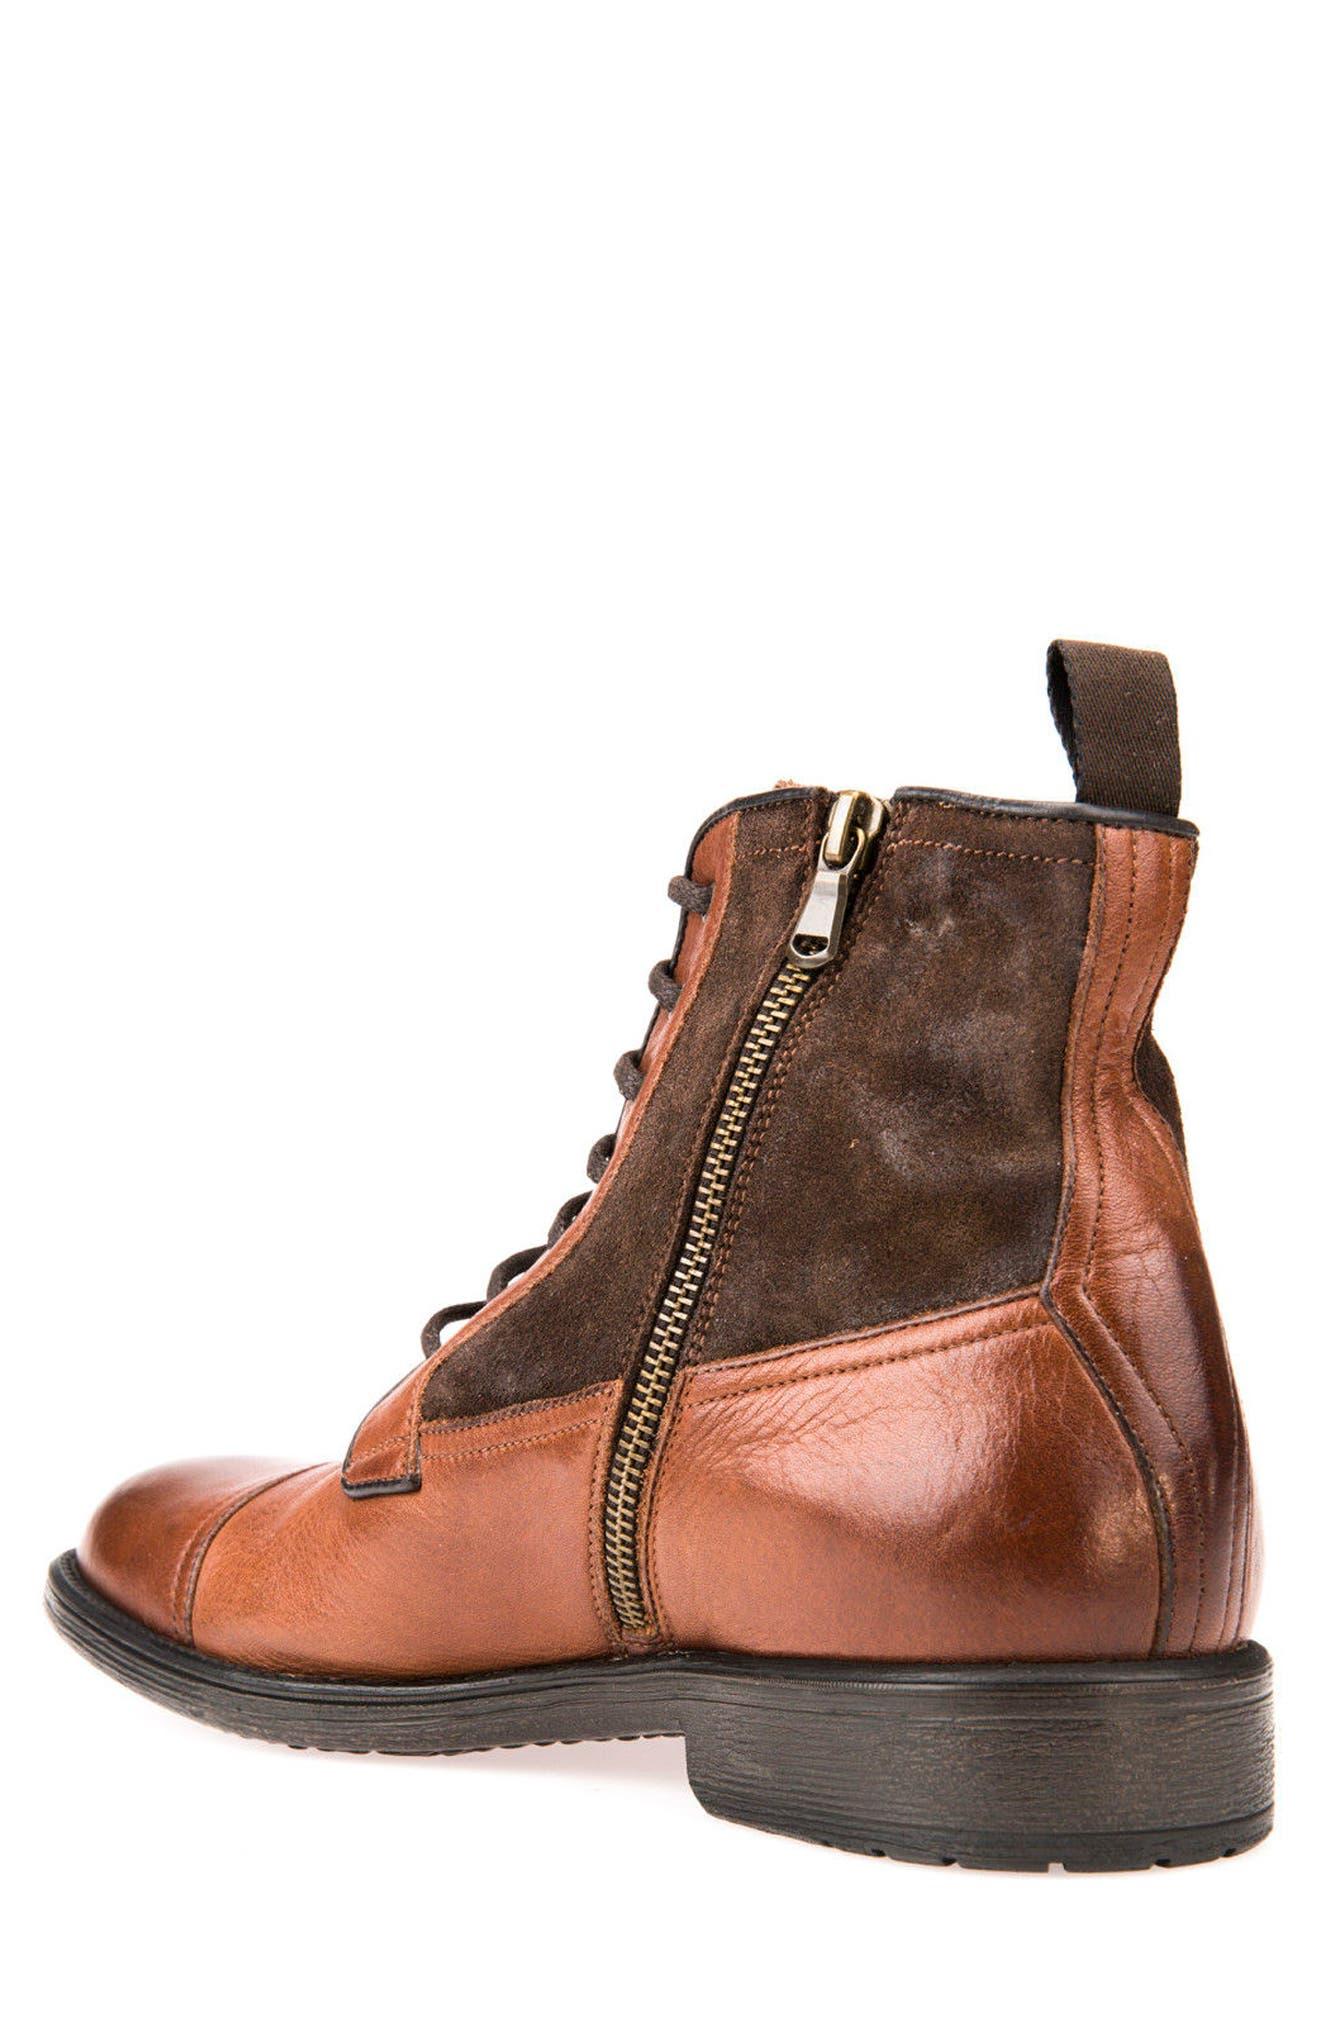 Jaylon 12 Cap-Toe Boot,                             Alternate thumbnail 2, color,                             Ebony